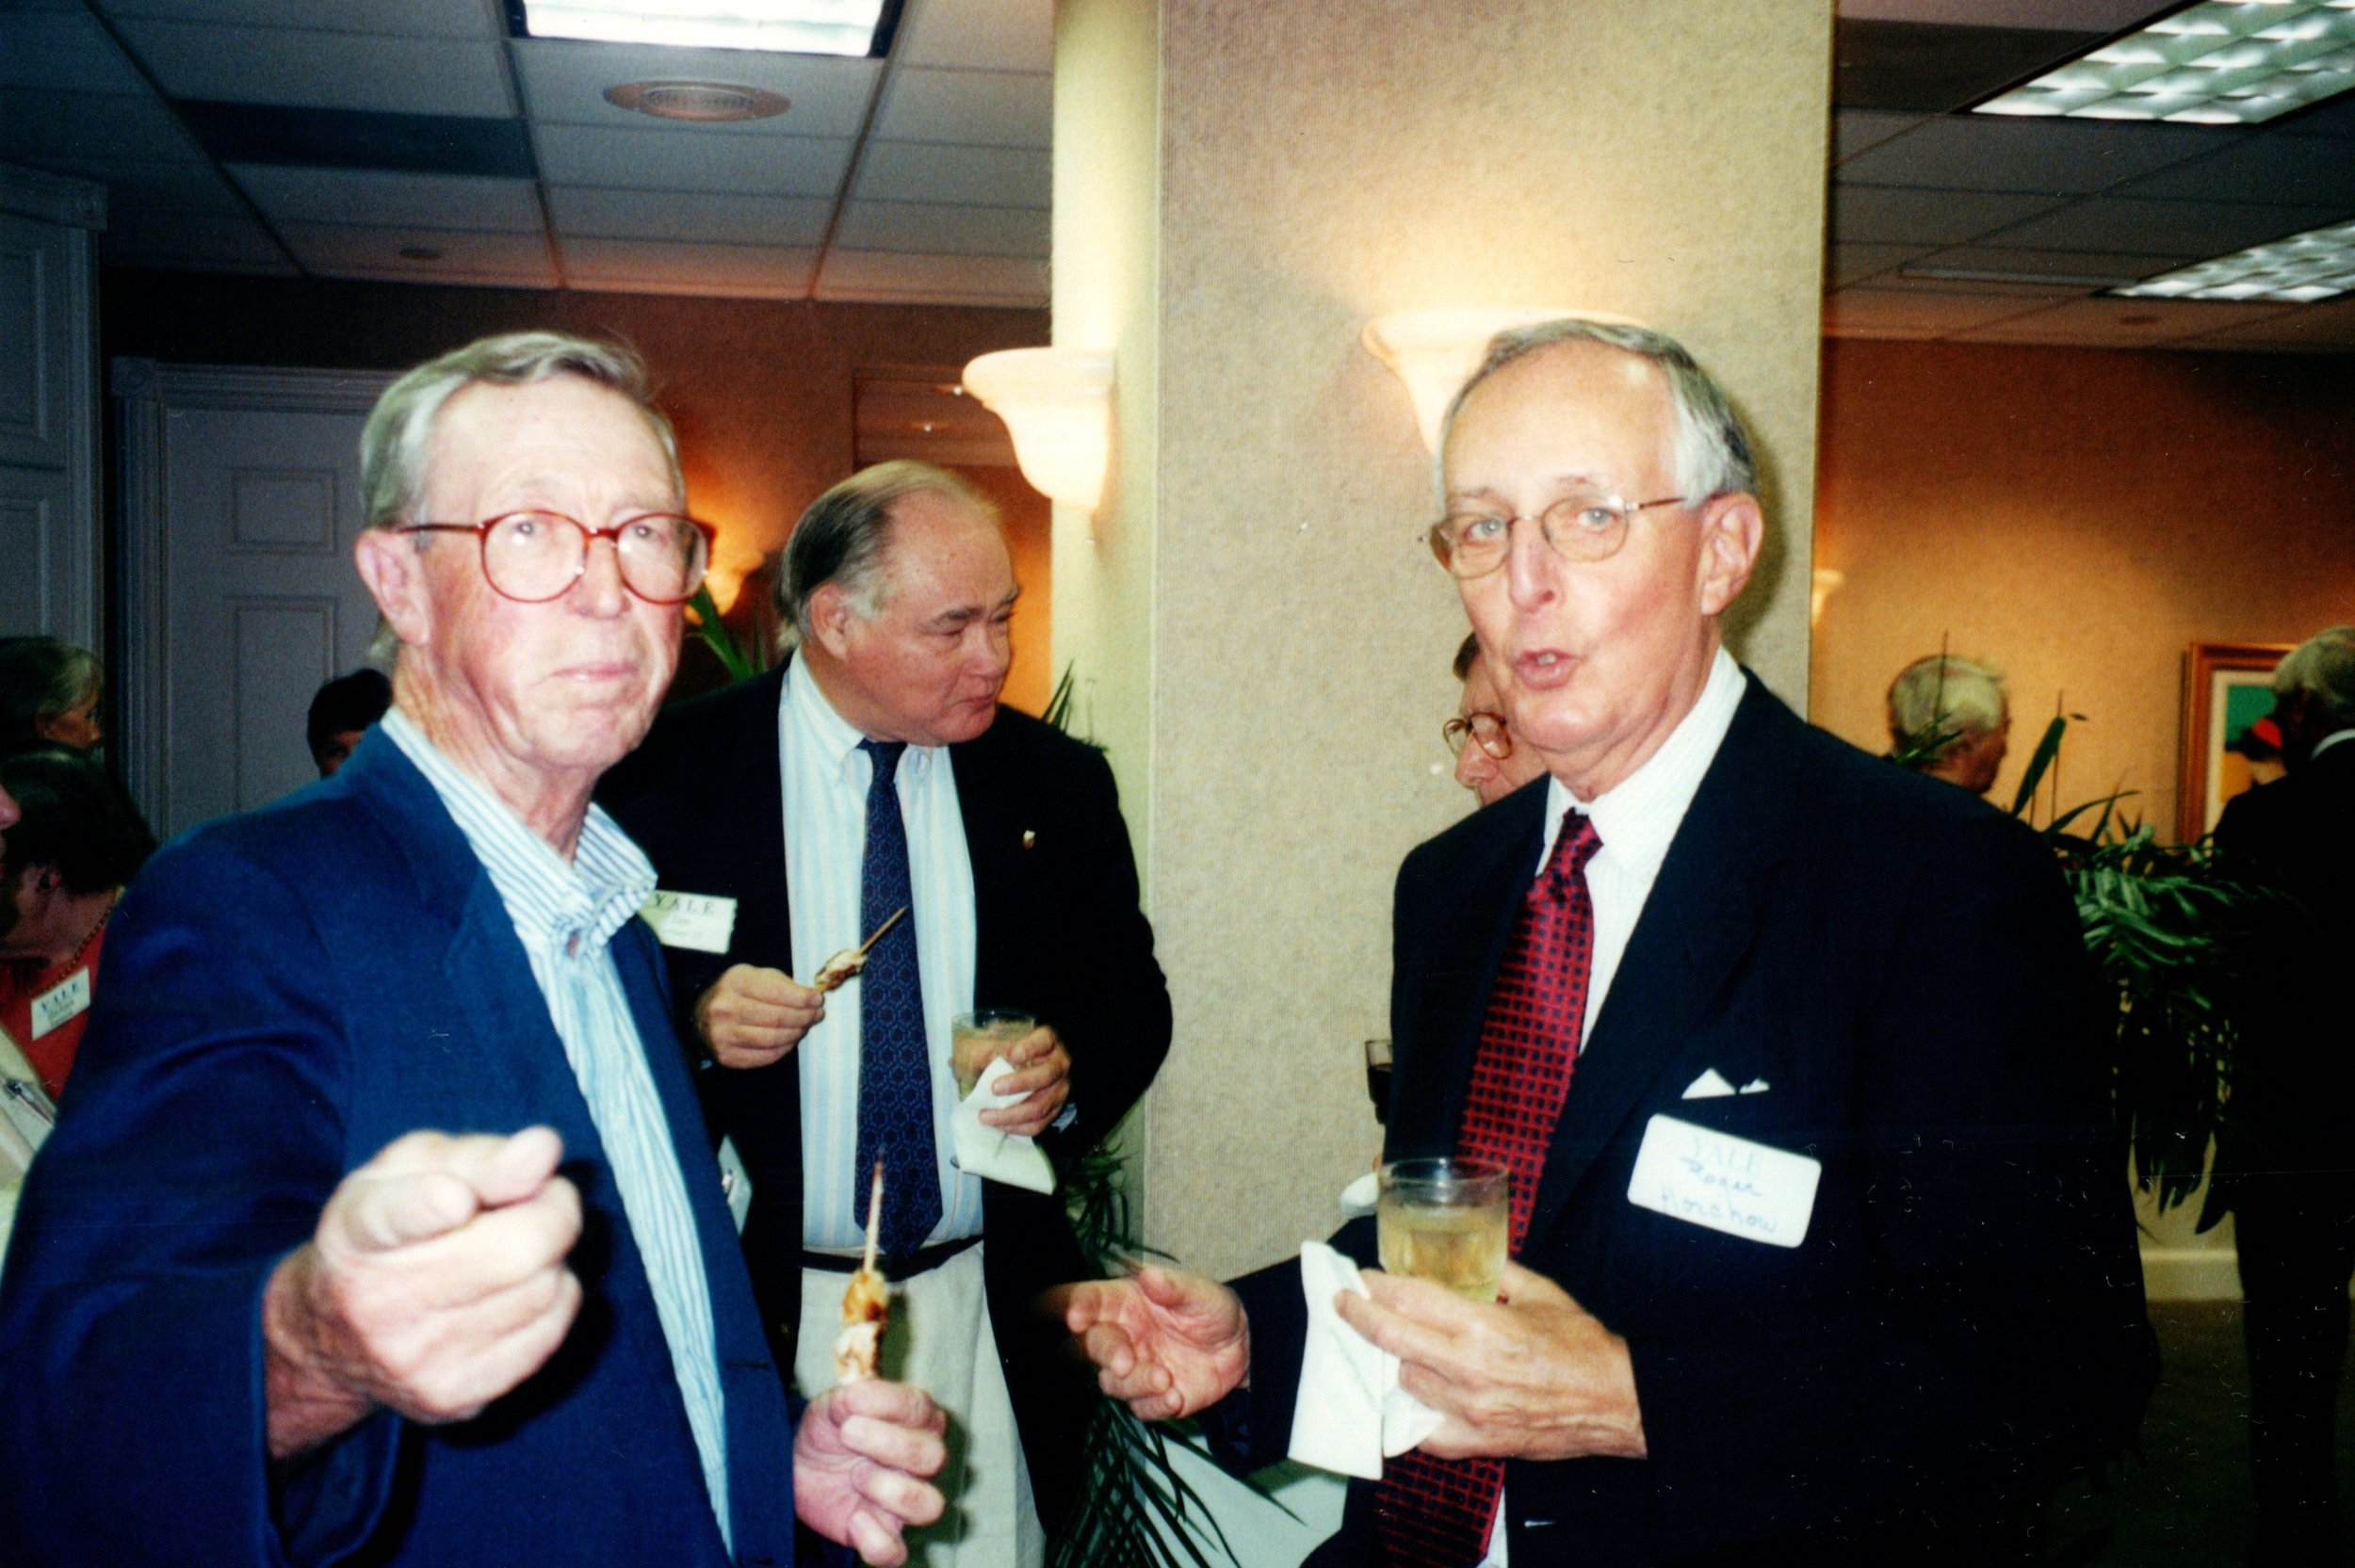 PETE BROADBENT, JIM CARTHAUS, ROGER HORCHOW